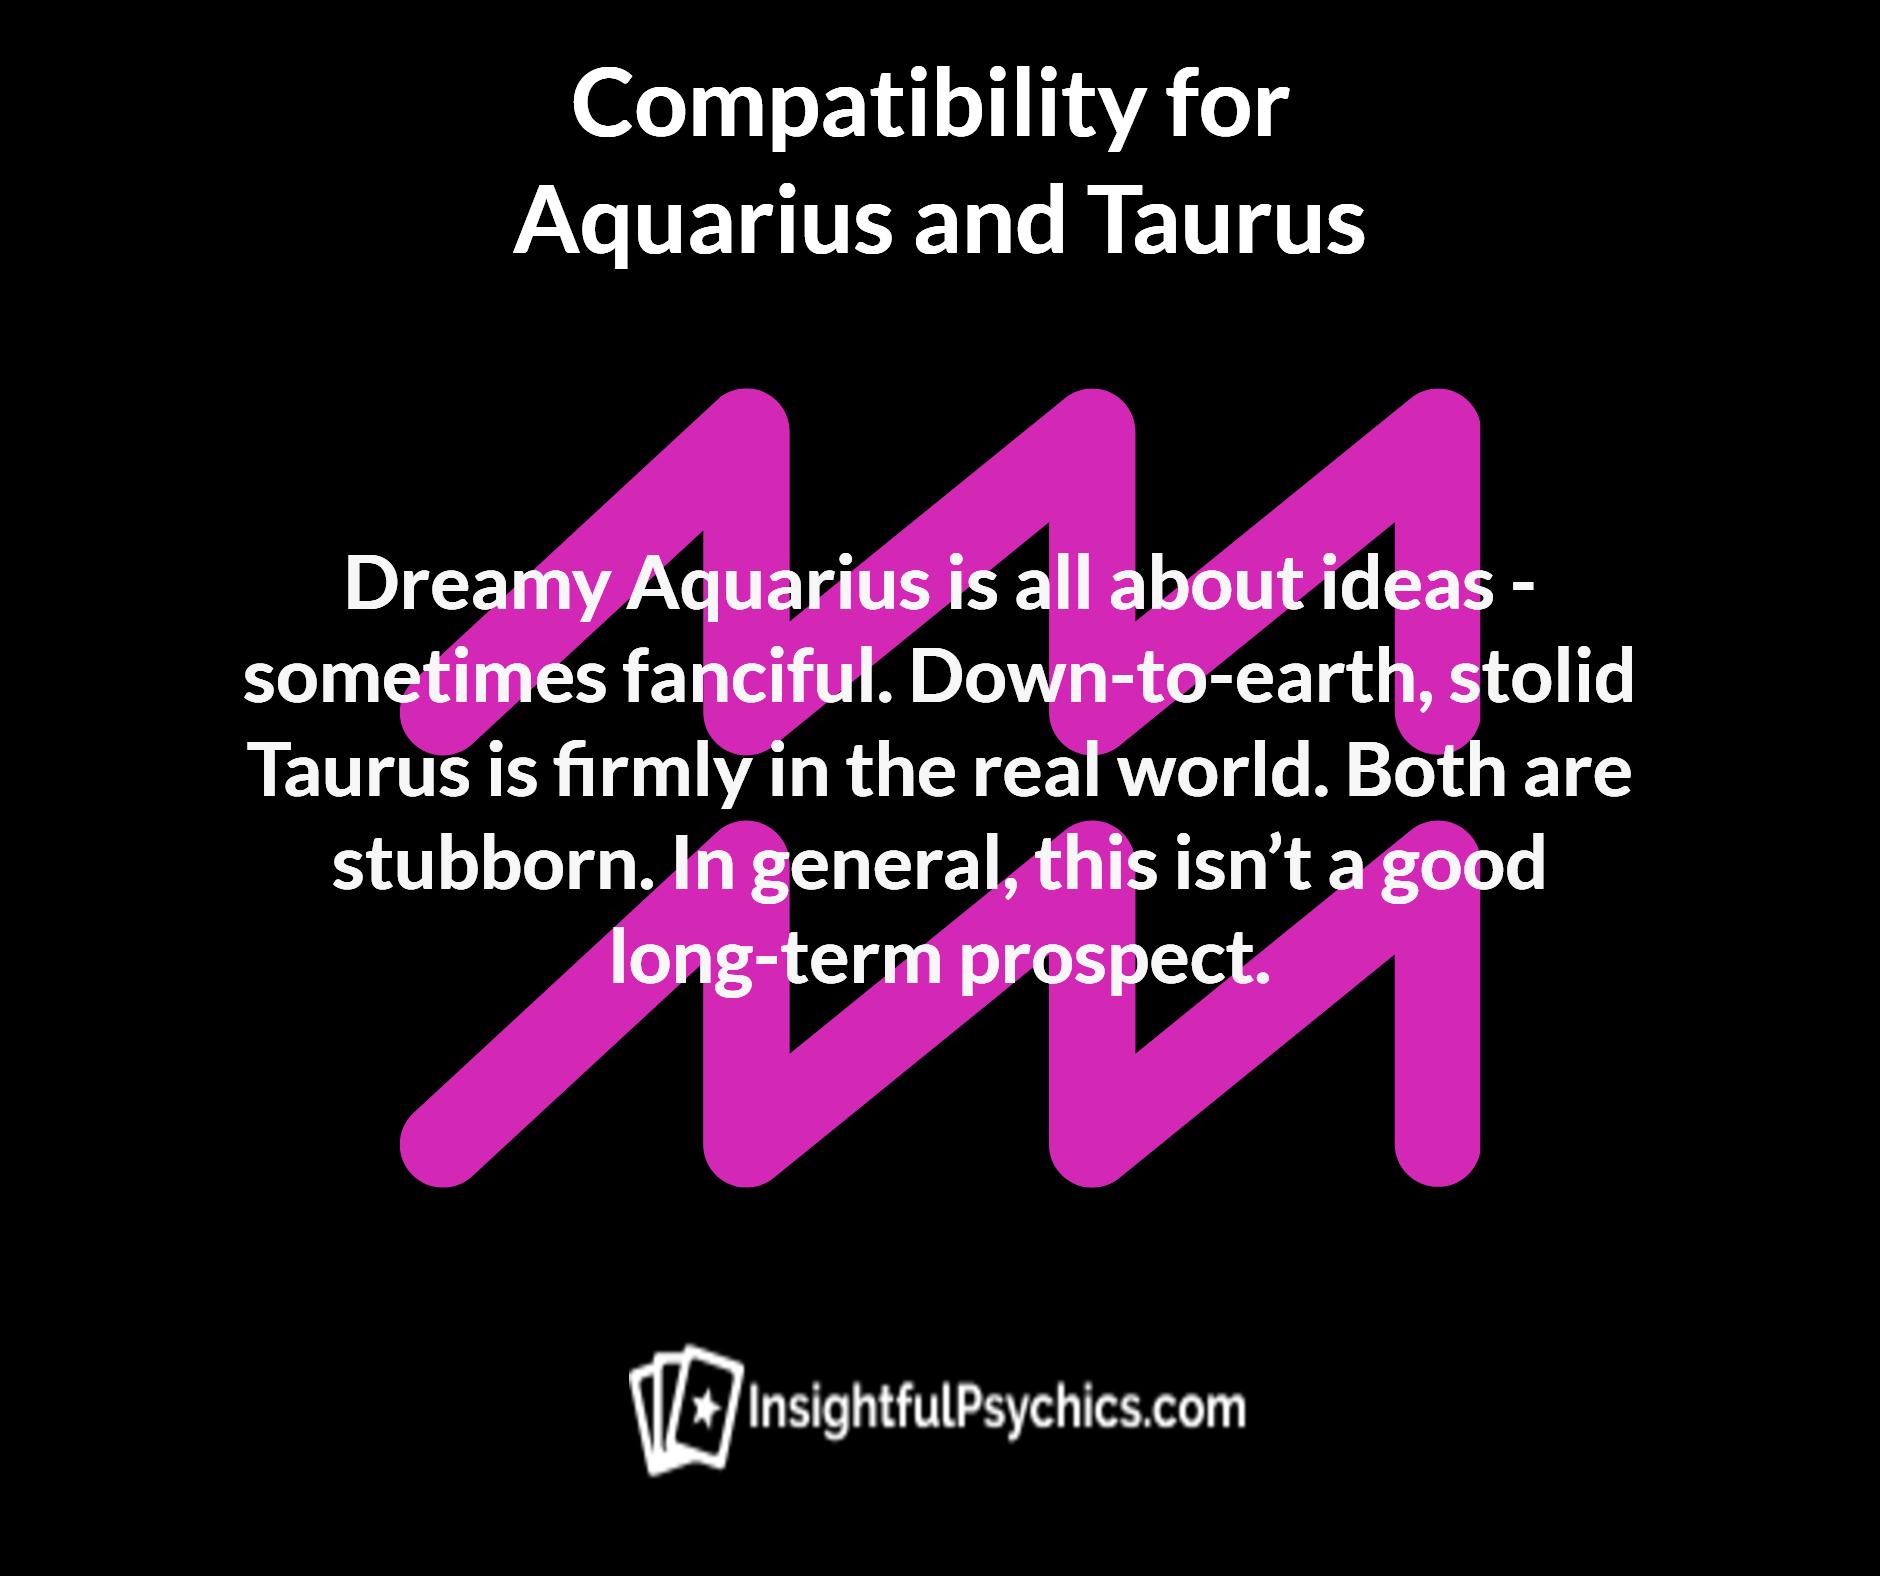 Aquarius Dates: January 20 - February 18